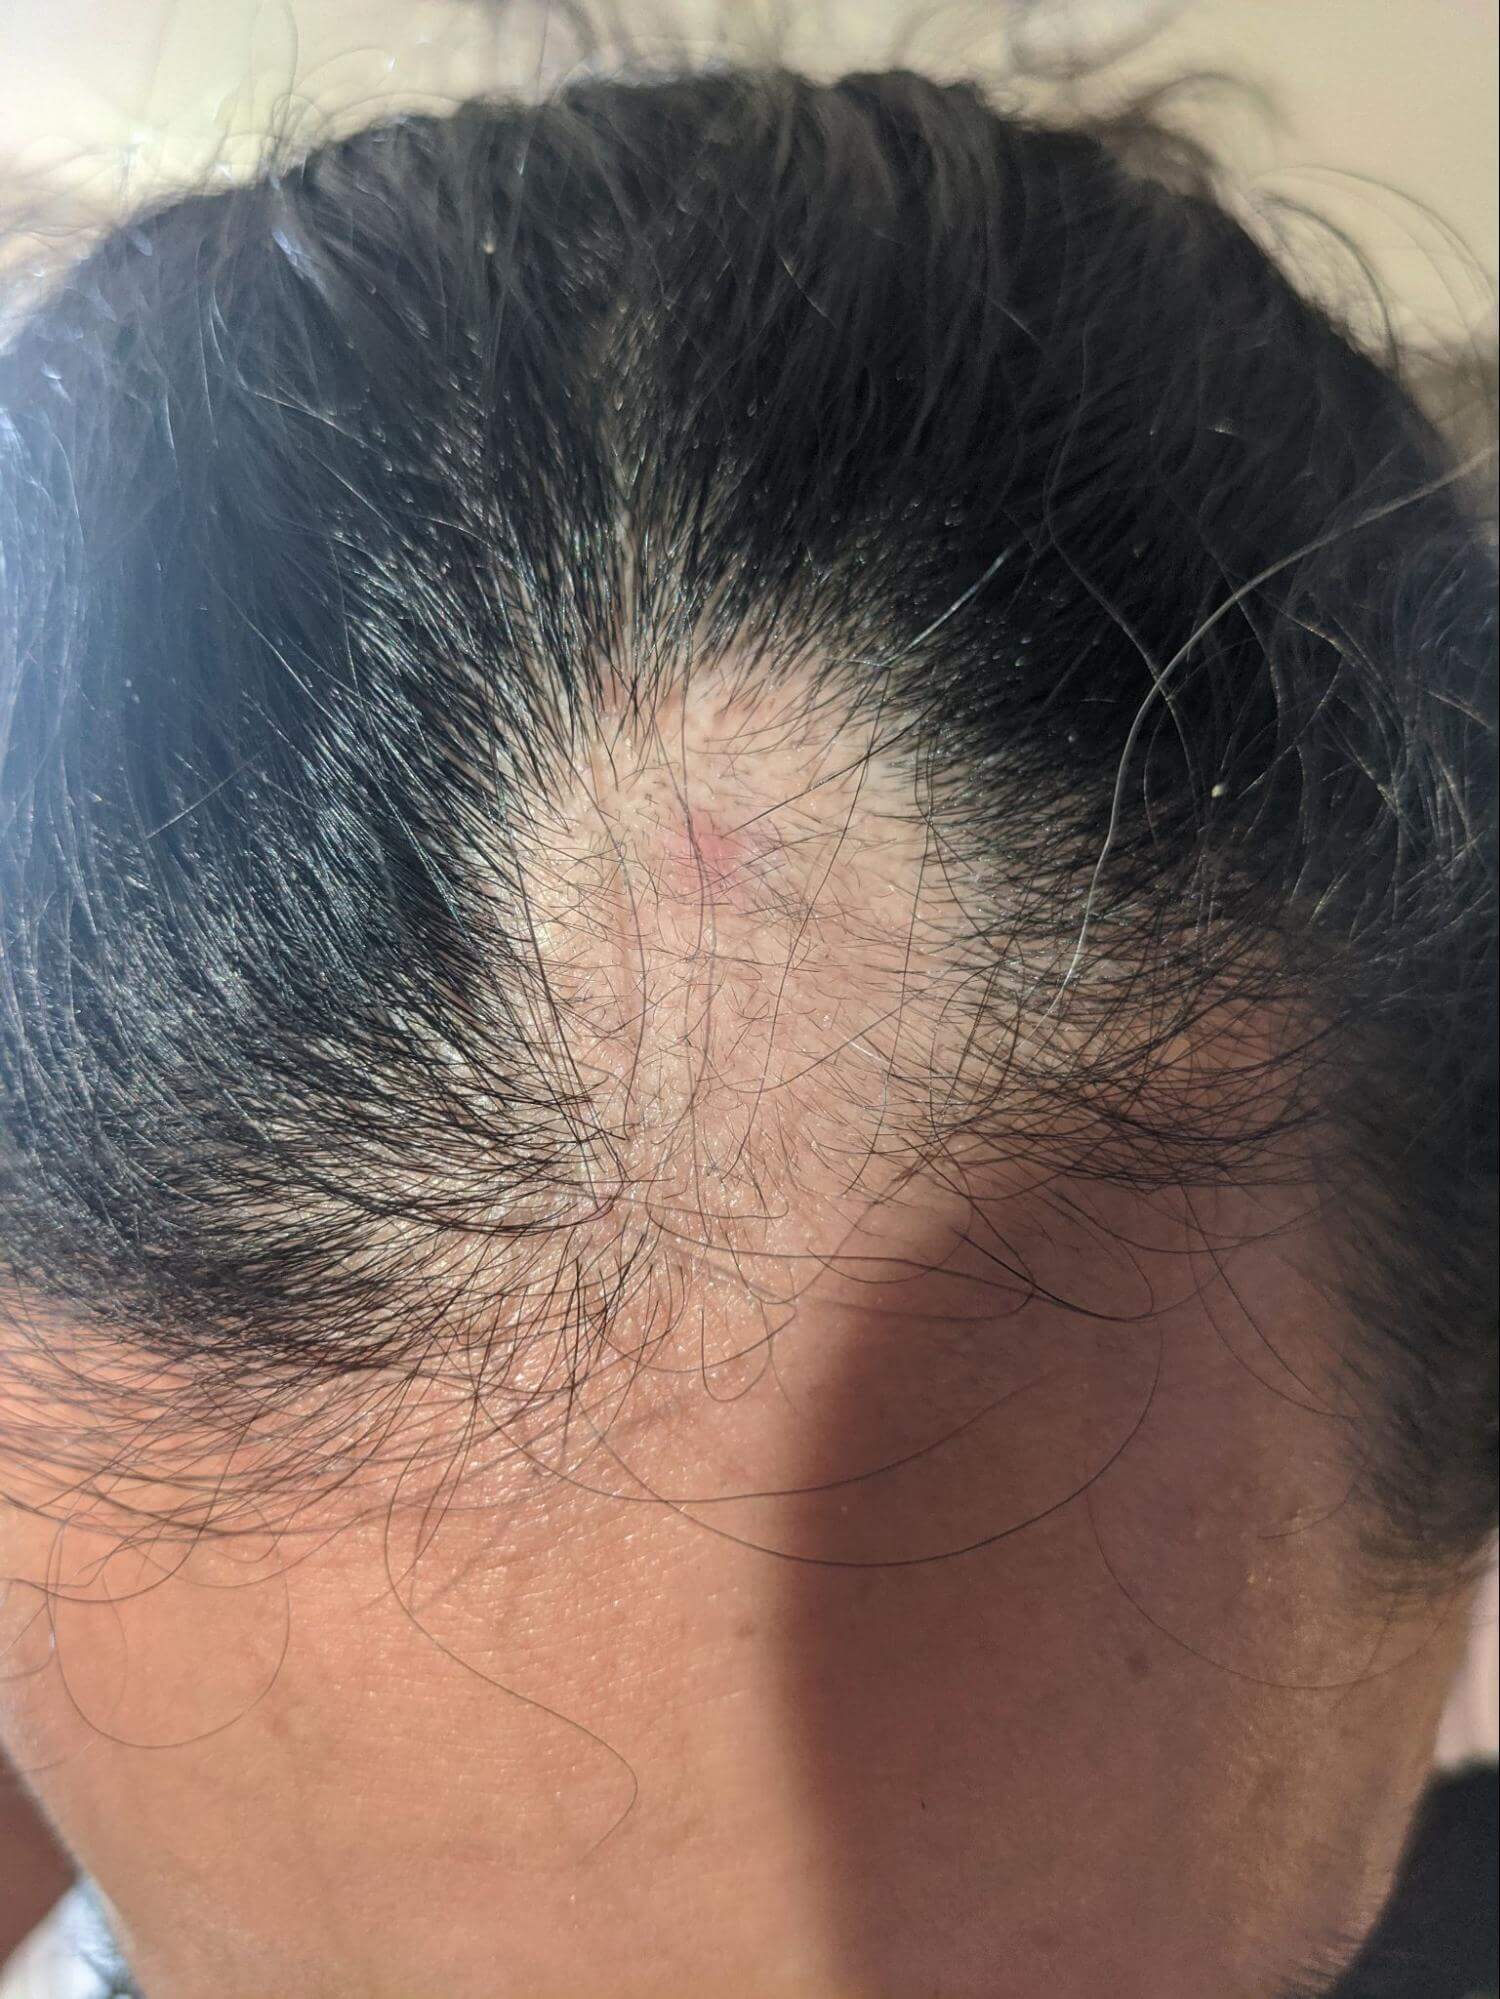 Close-up of a circular patch of hair loss from alopecia.